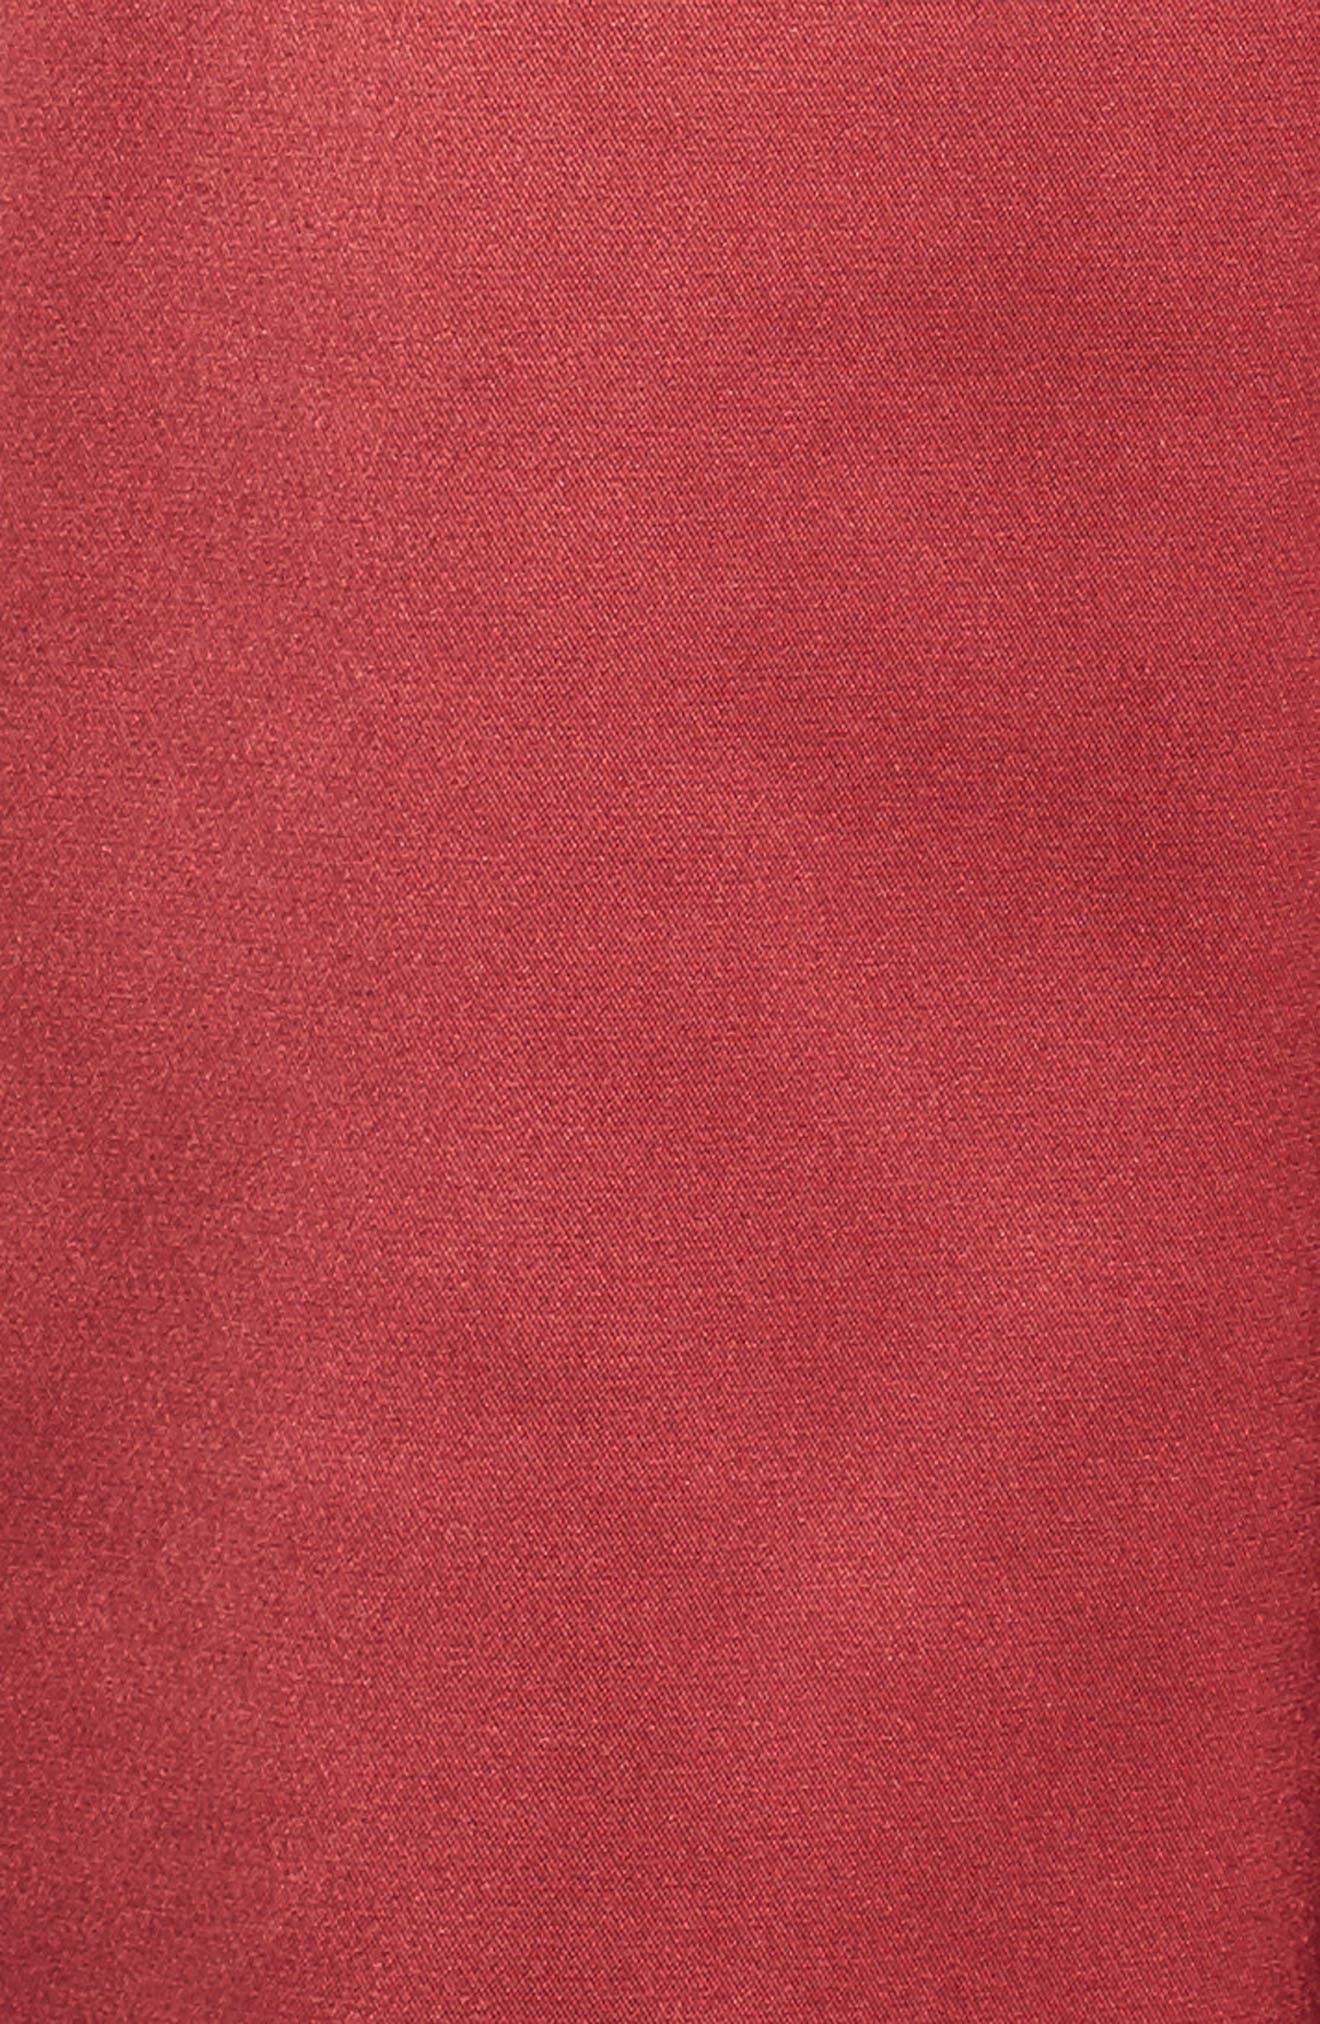 Off the Shoulder Satin Dress,                             Alternate thumbnail 5, color,                             Merlot